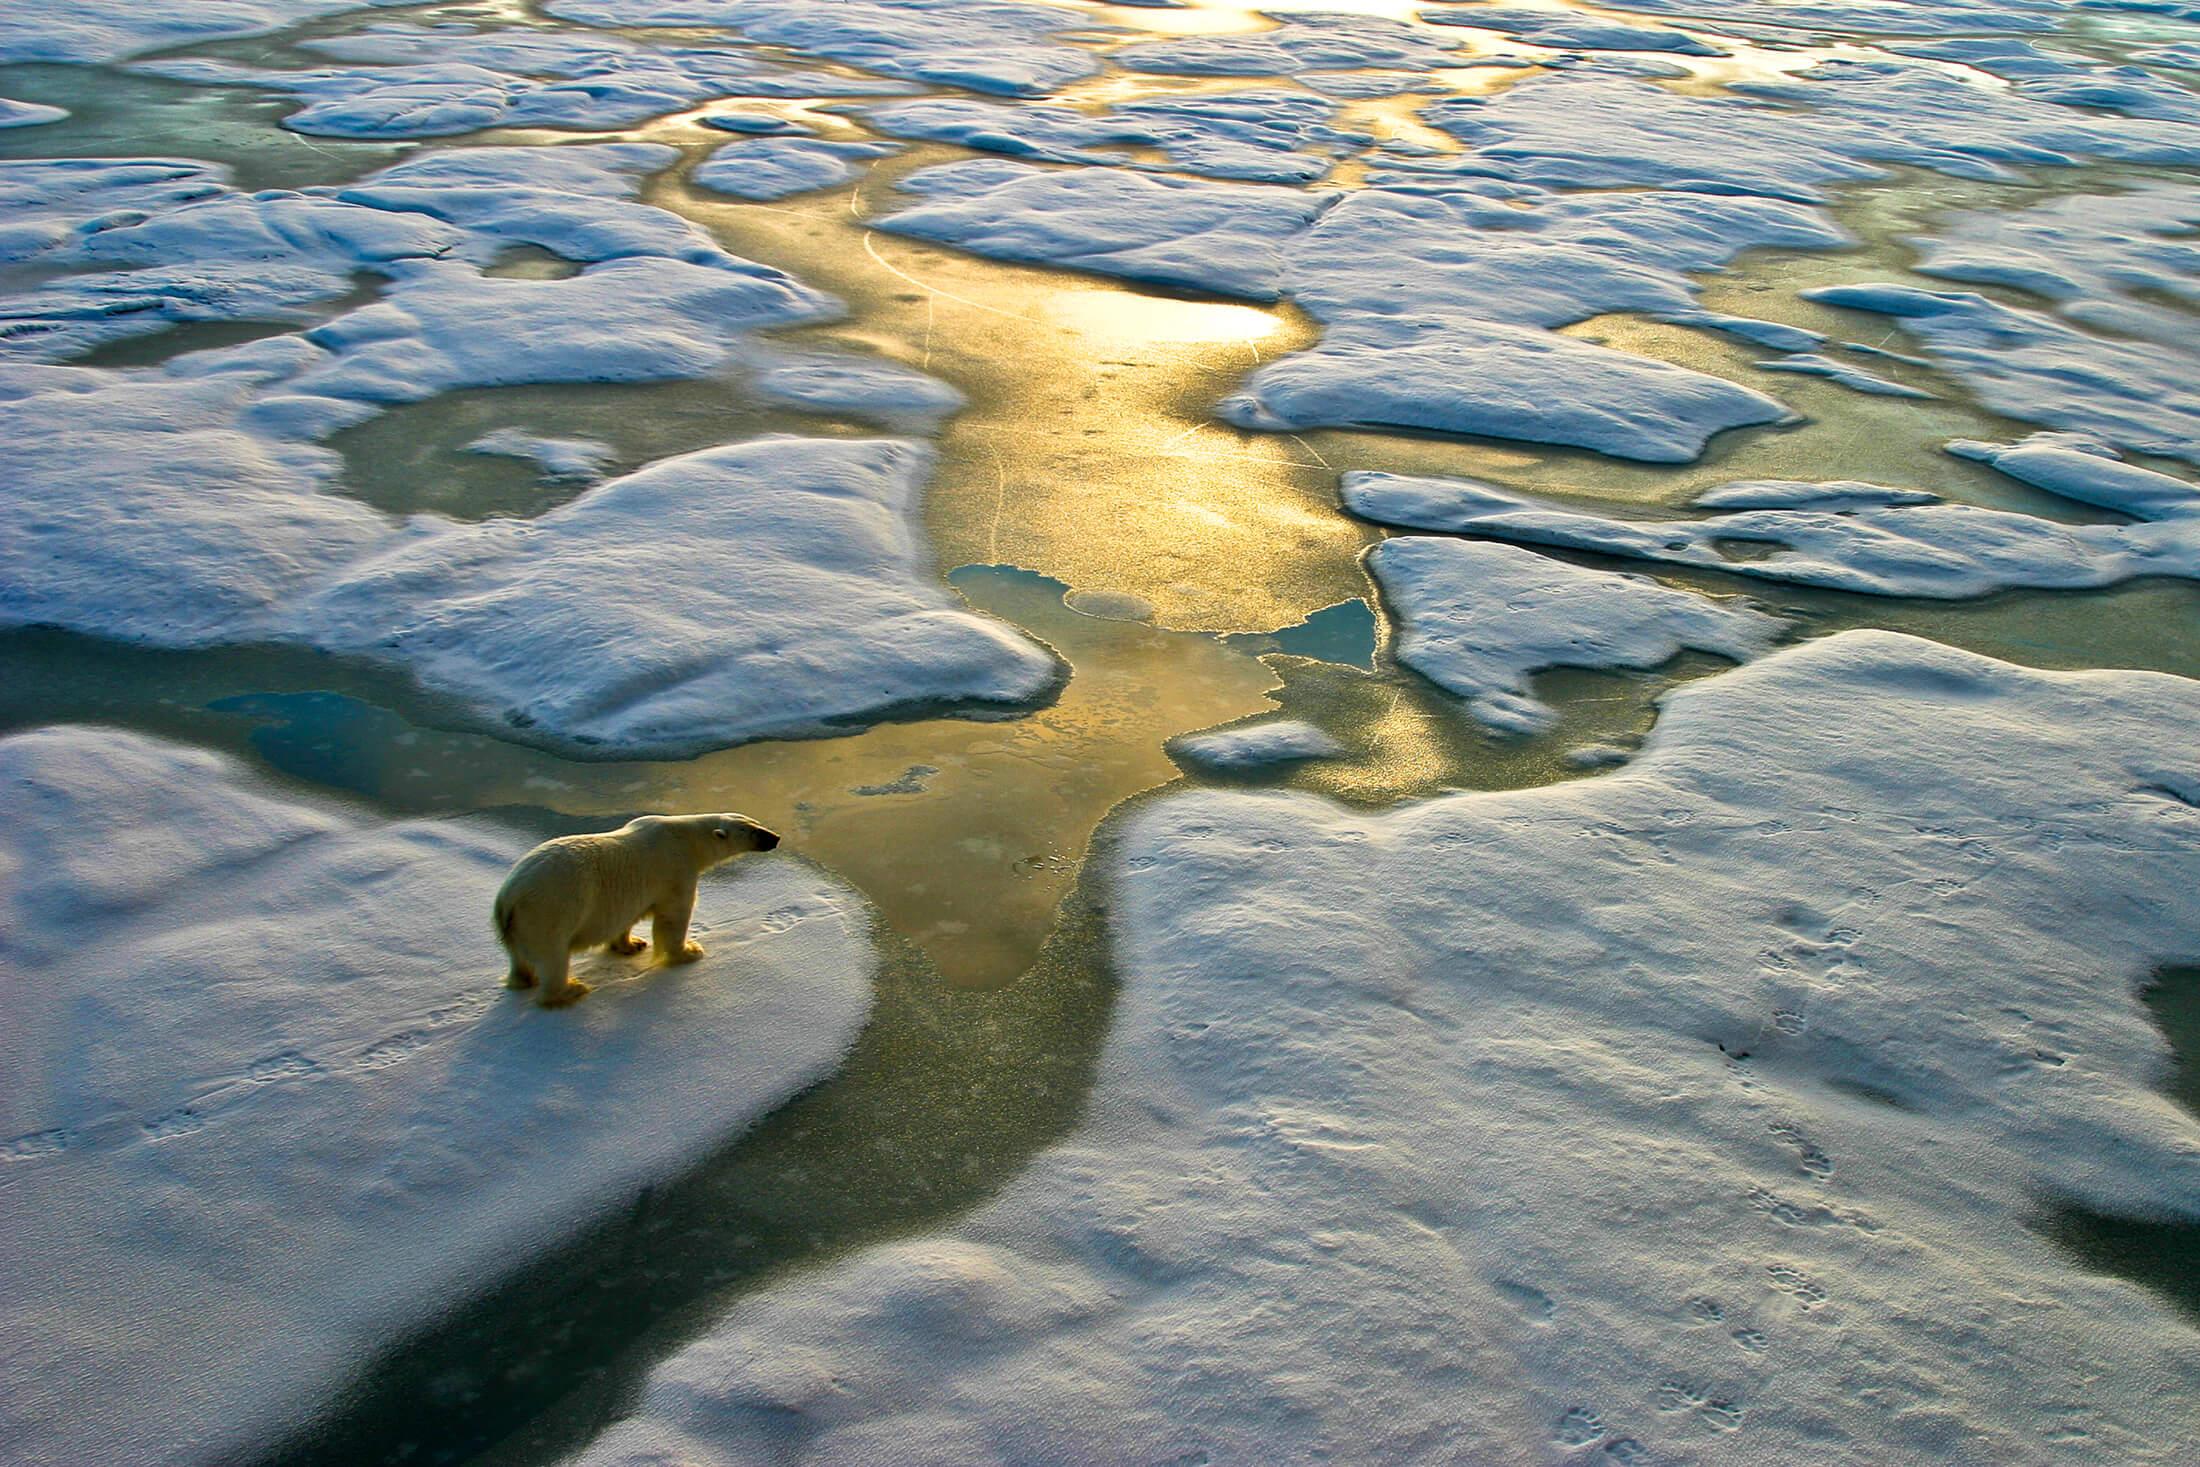 Polar bear looking at melting ice caps